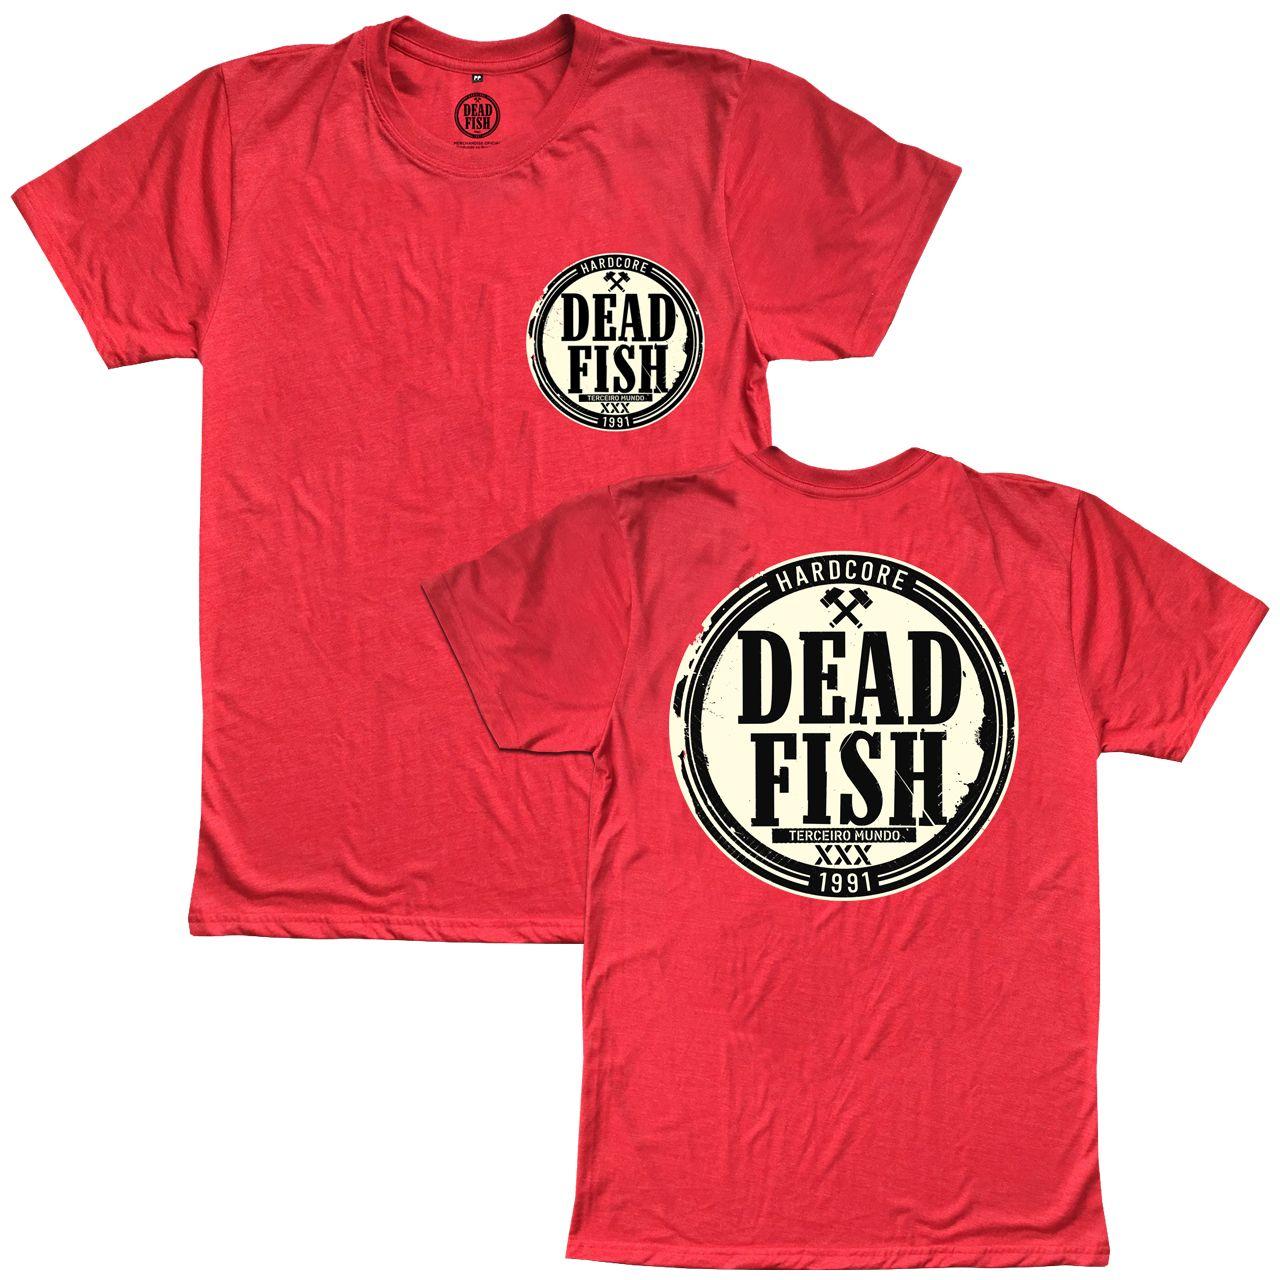 Dead Fish - Terceiro Mundo